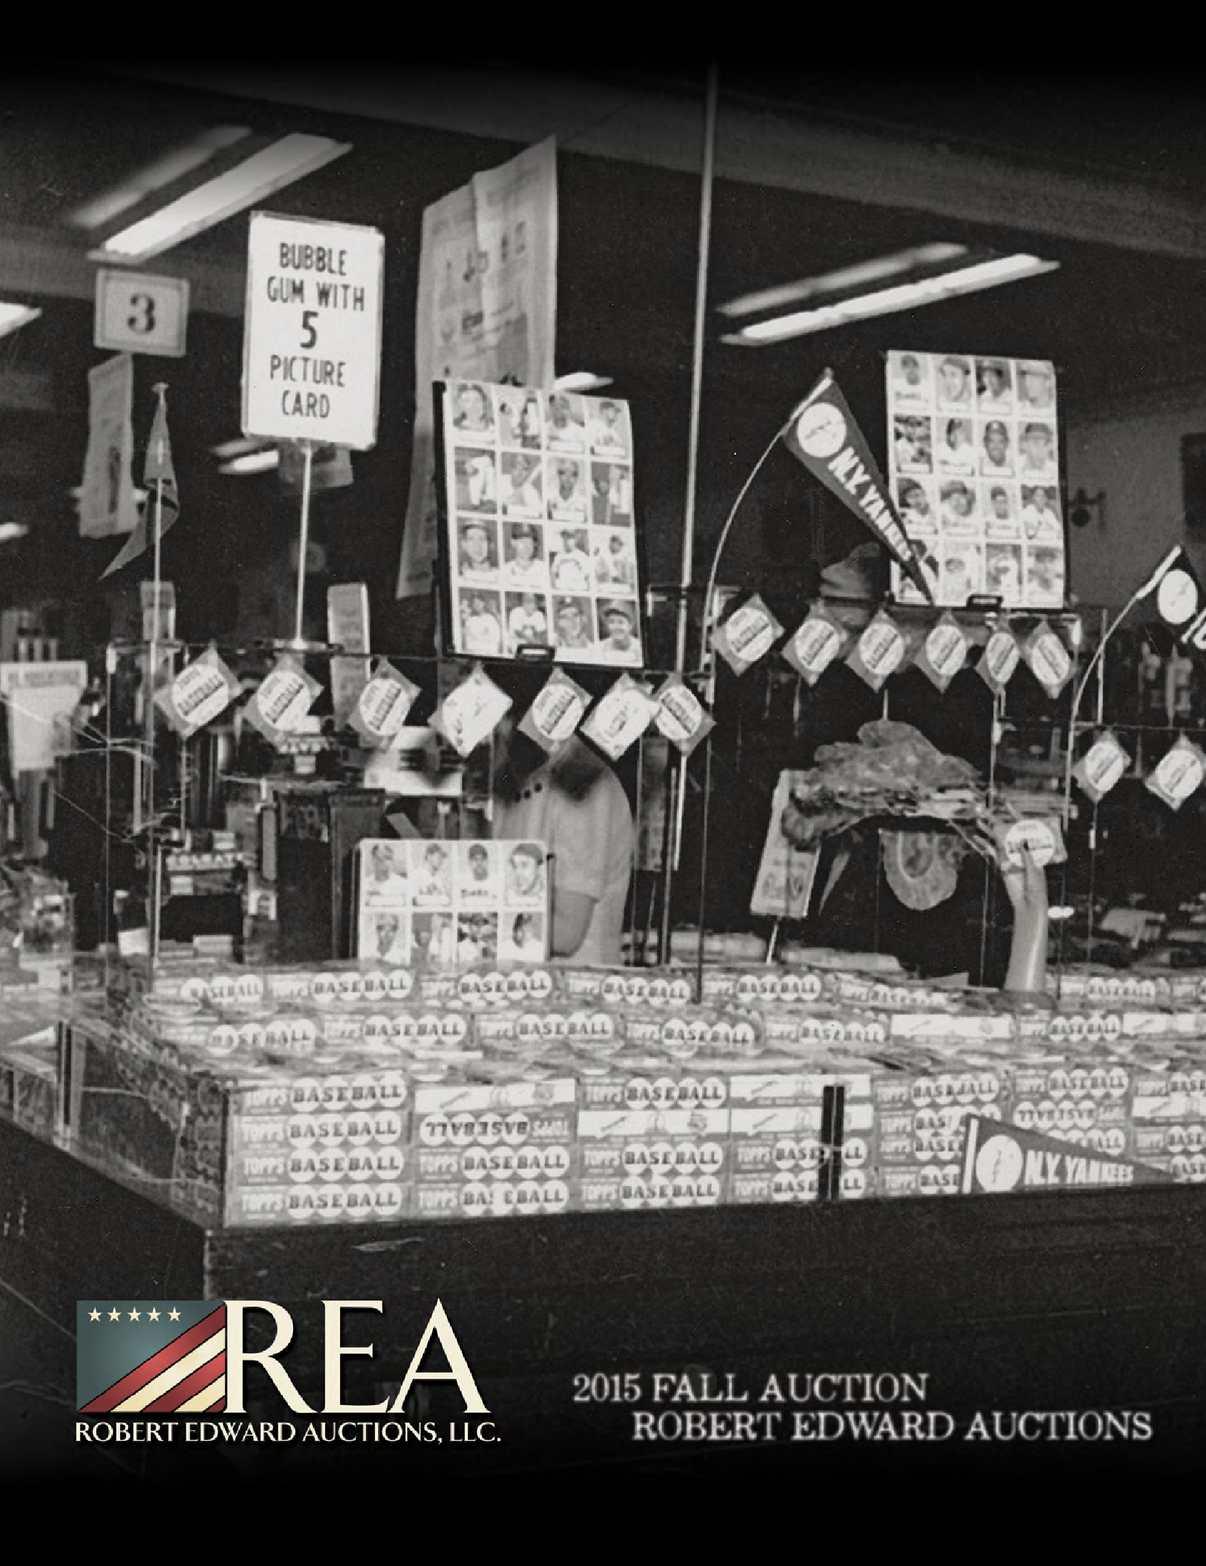 #LK.1000 MIKE SCHMIDT 1949 Wheat Penny Insert Trade Card RARE